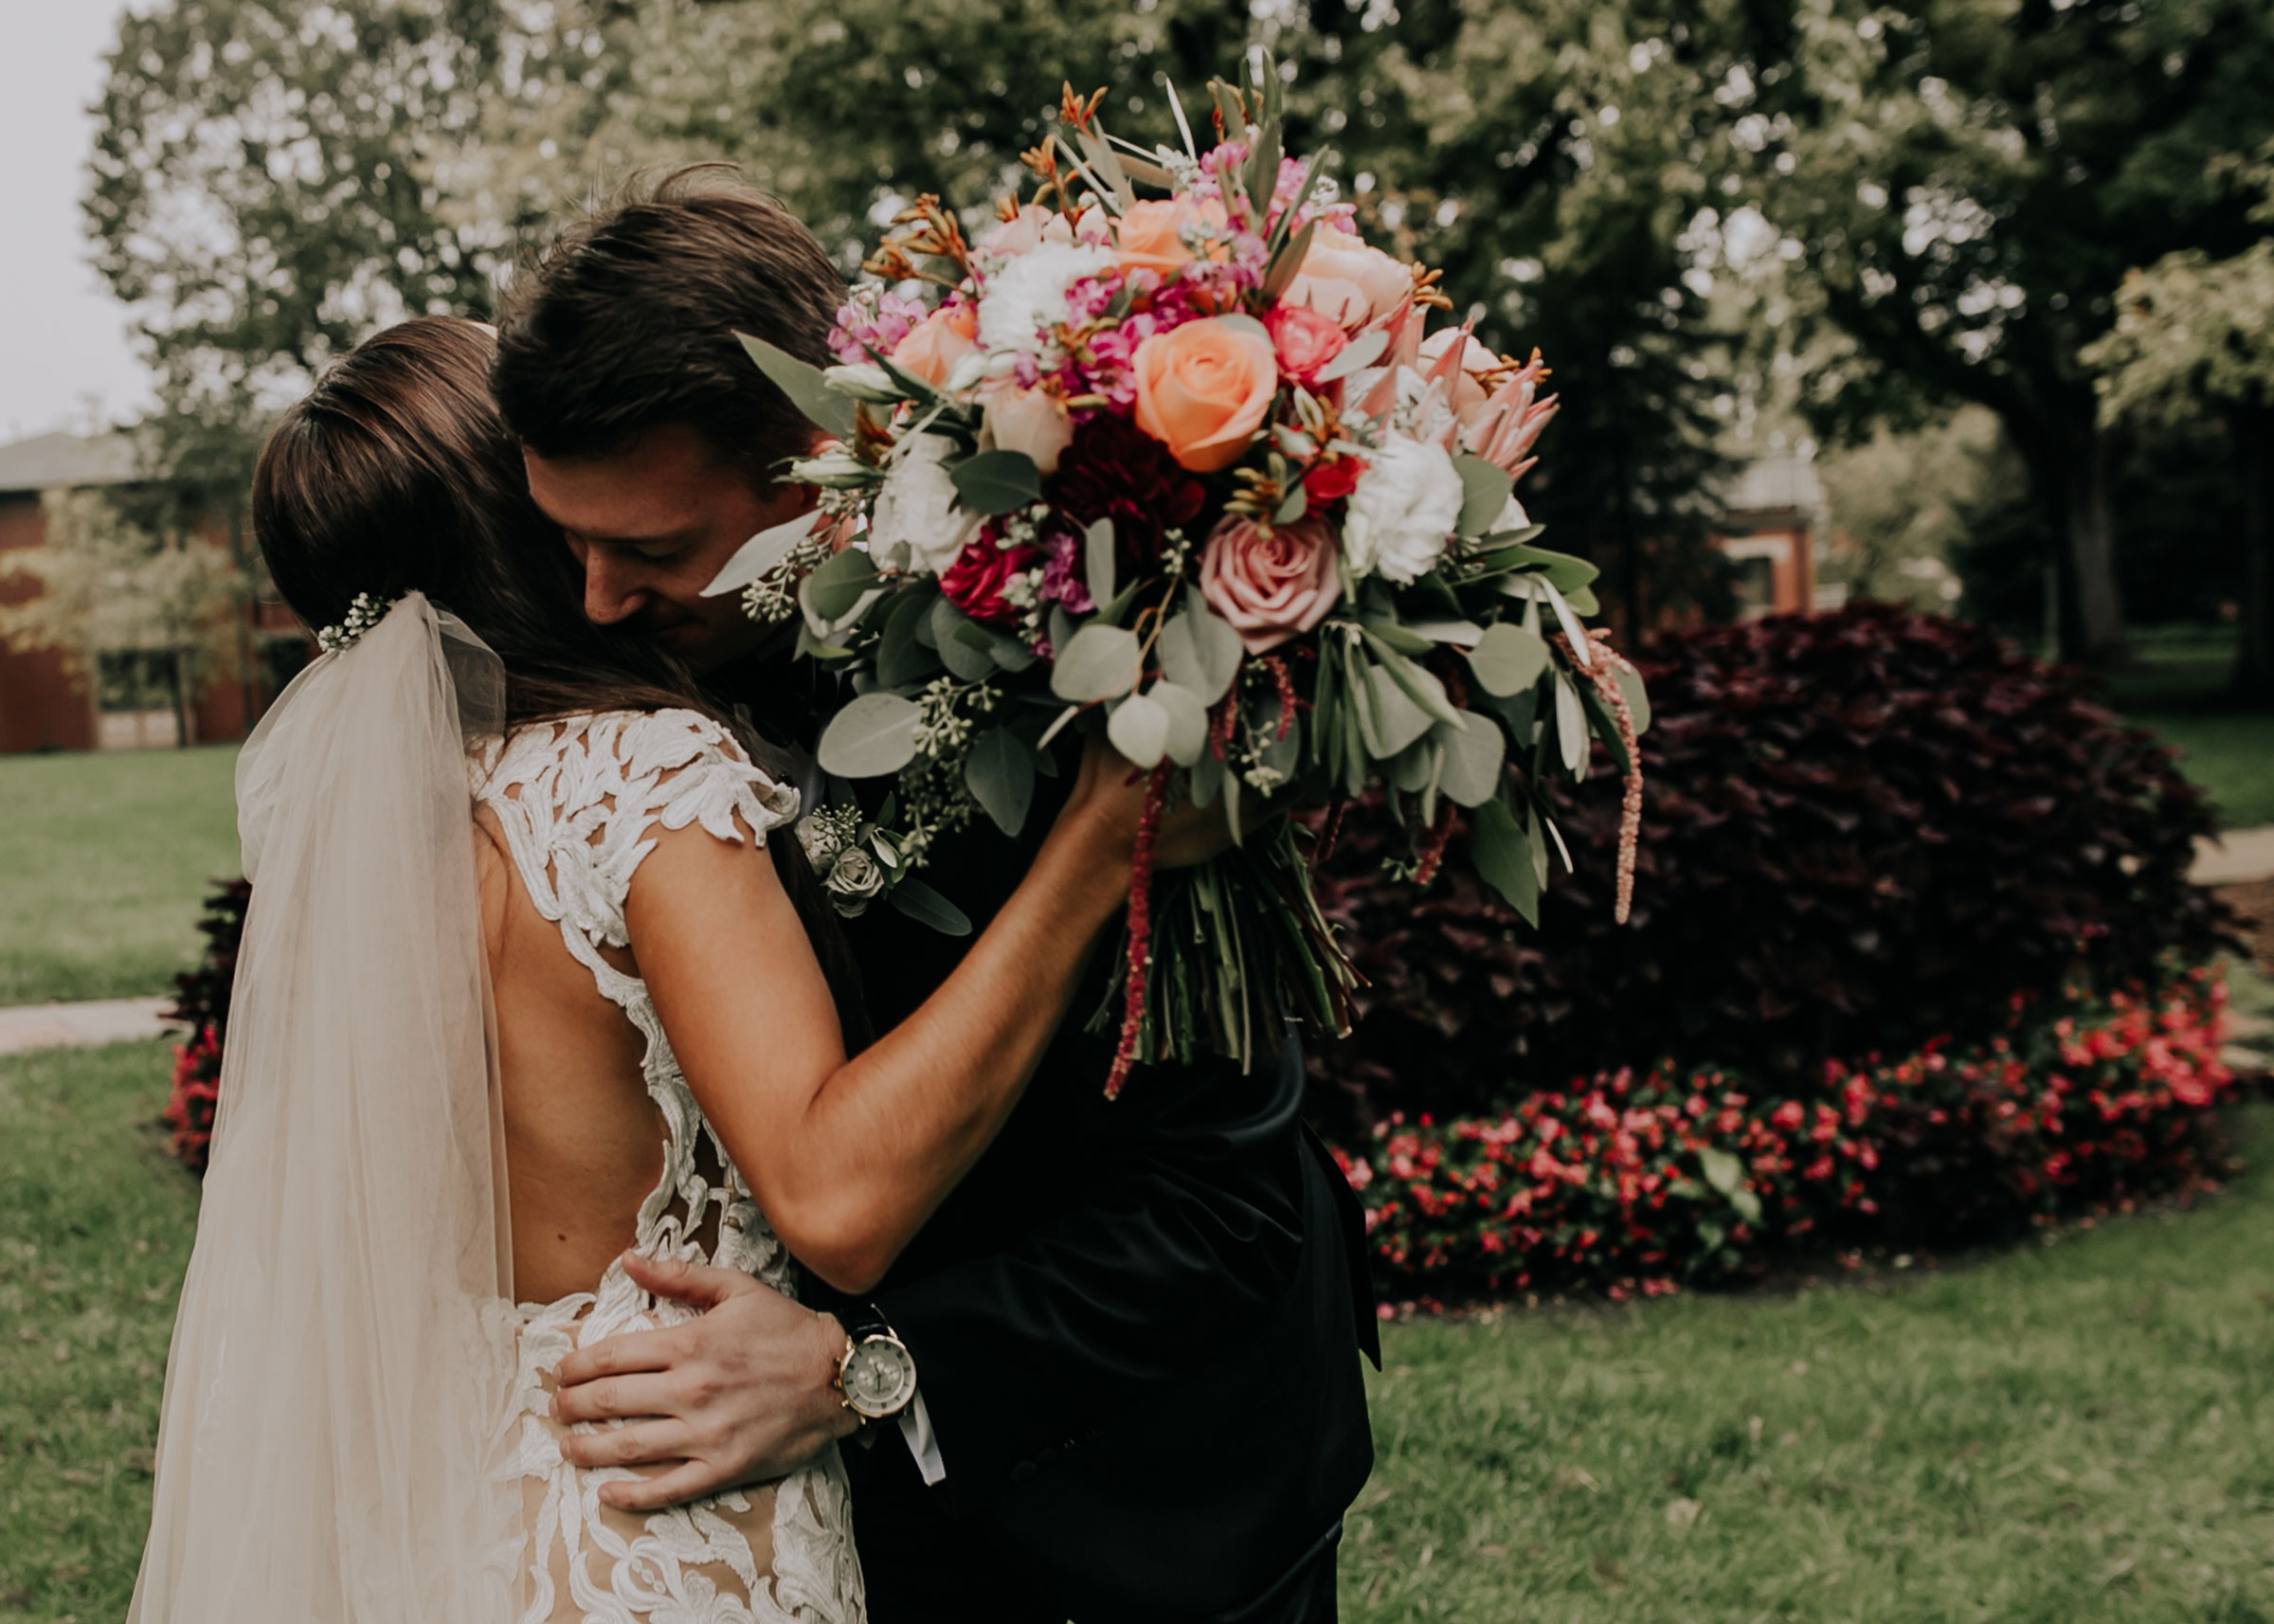 bride-groom-hug-during-first-look-st-johns-church-at-creighton-omaha-nebraska-raelyn-ramey-photography.jpg